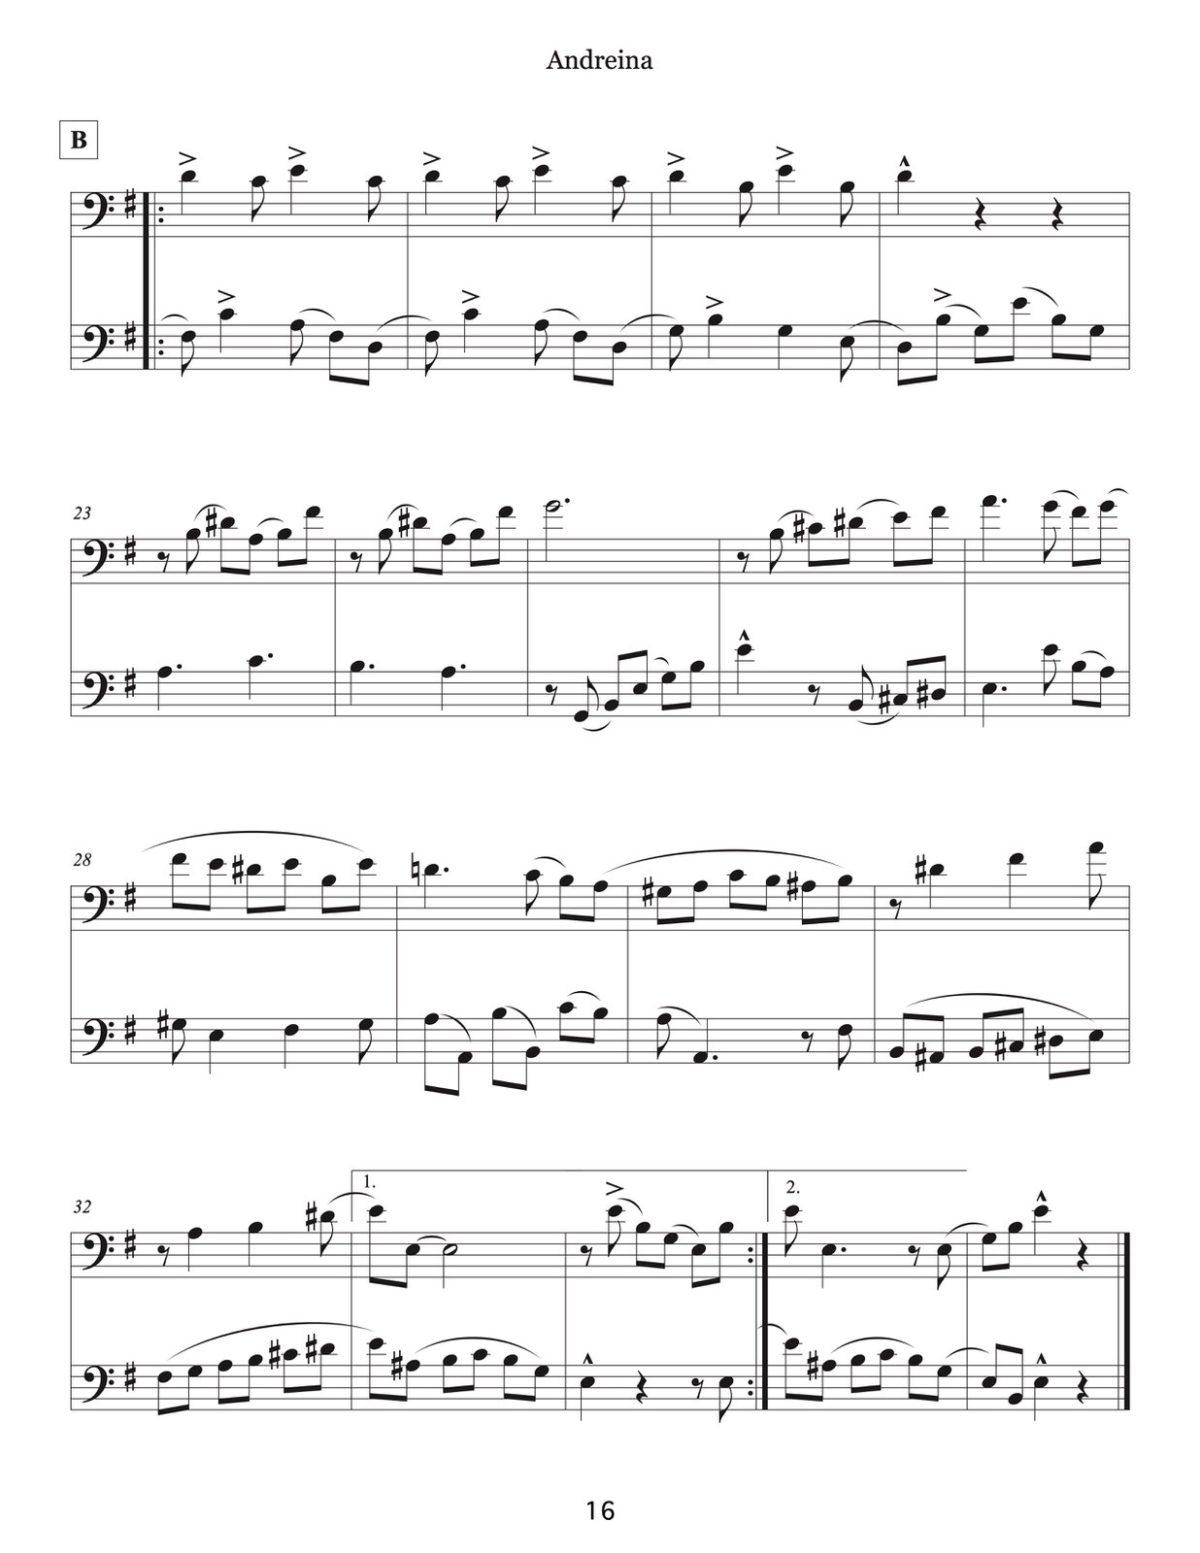 Veldkamp, 16 Venezuelan Waltzes for Trombone-p18